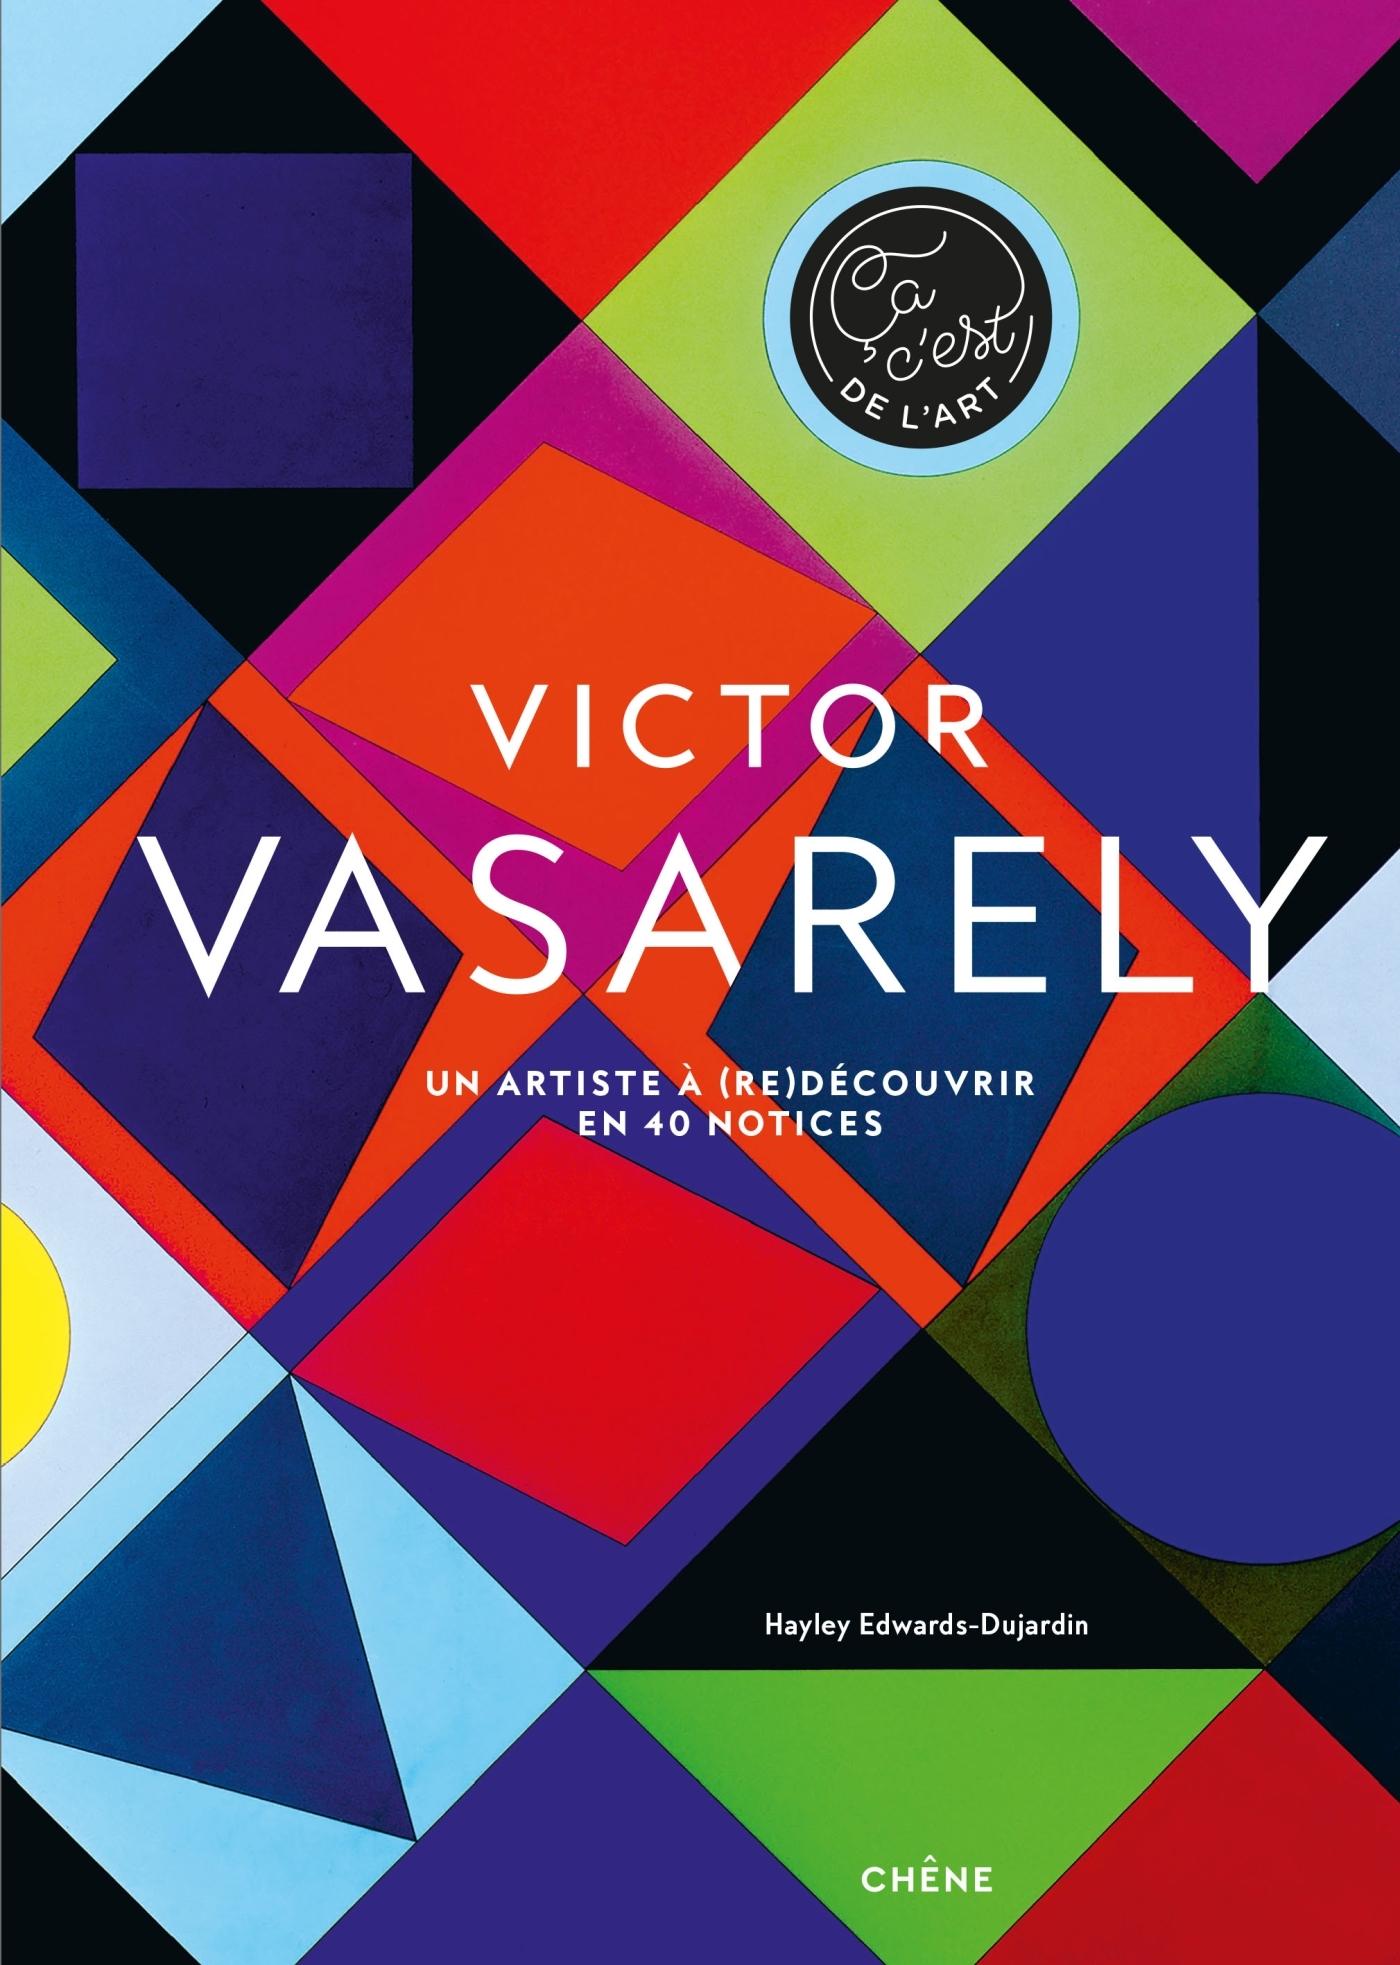 CA C'EST VICTOR VASARELY